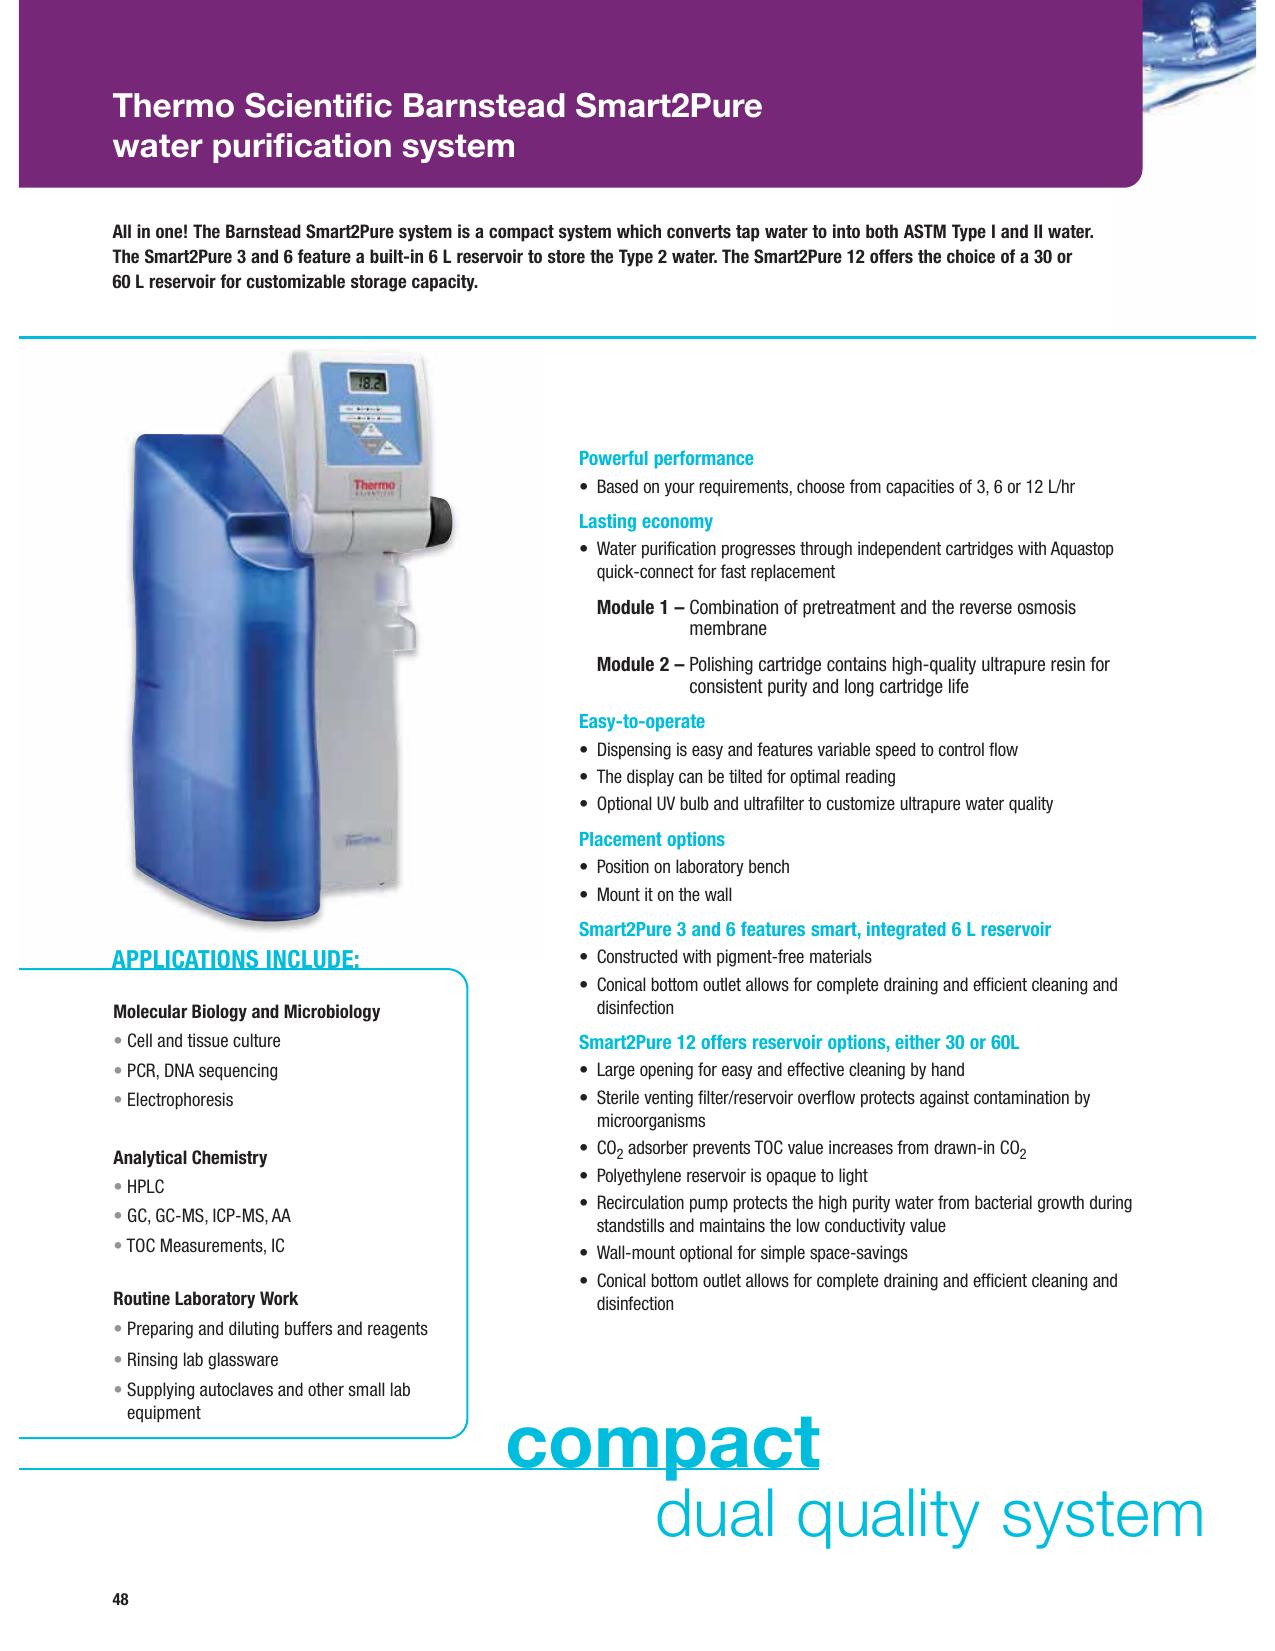 Smart2Pure Water Purification System | manualzz com